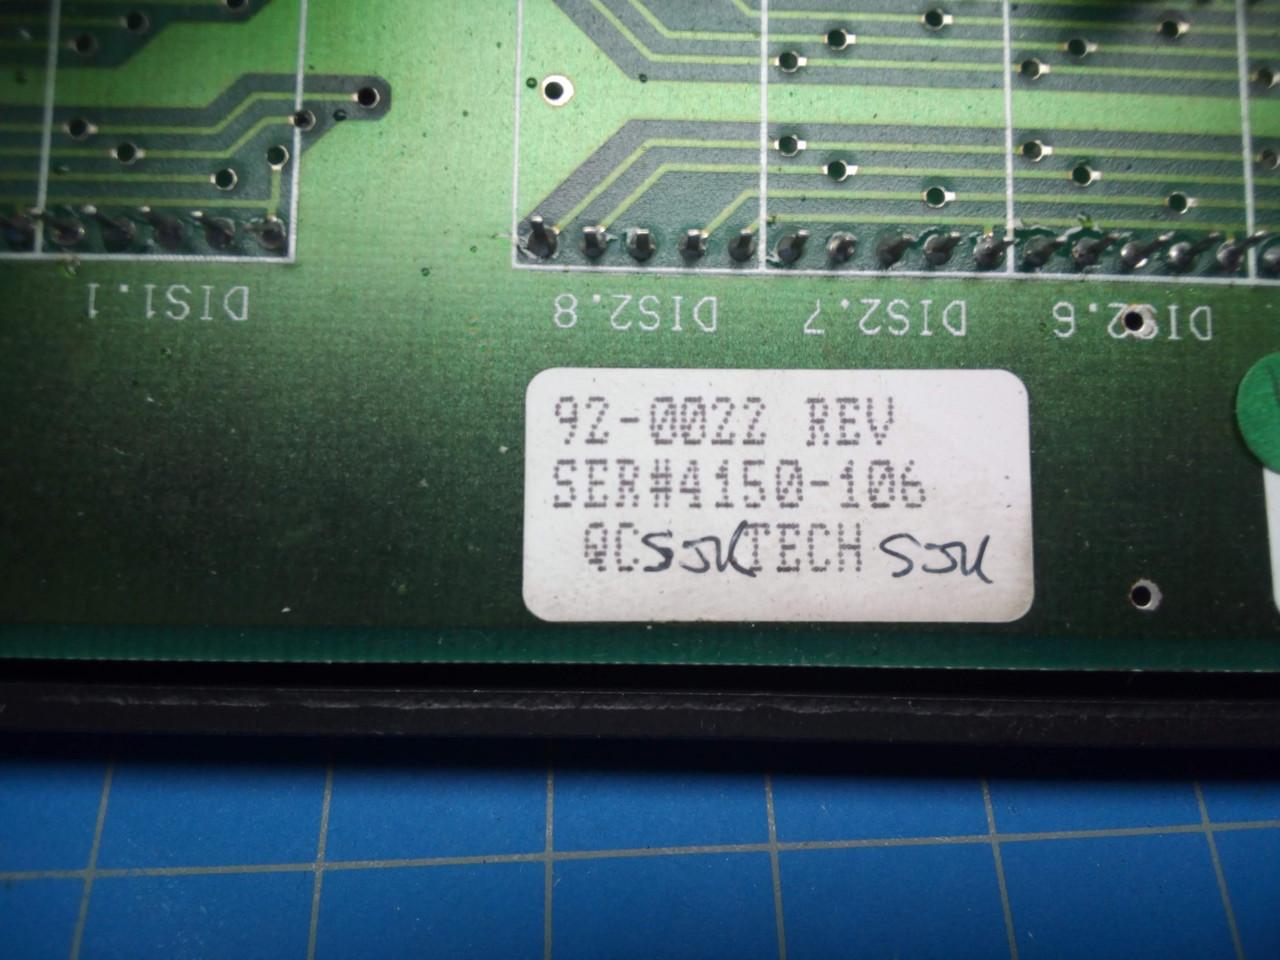 Stahl / Baum Display and Control Panel P02-000095